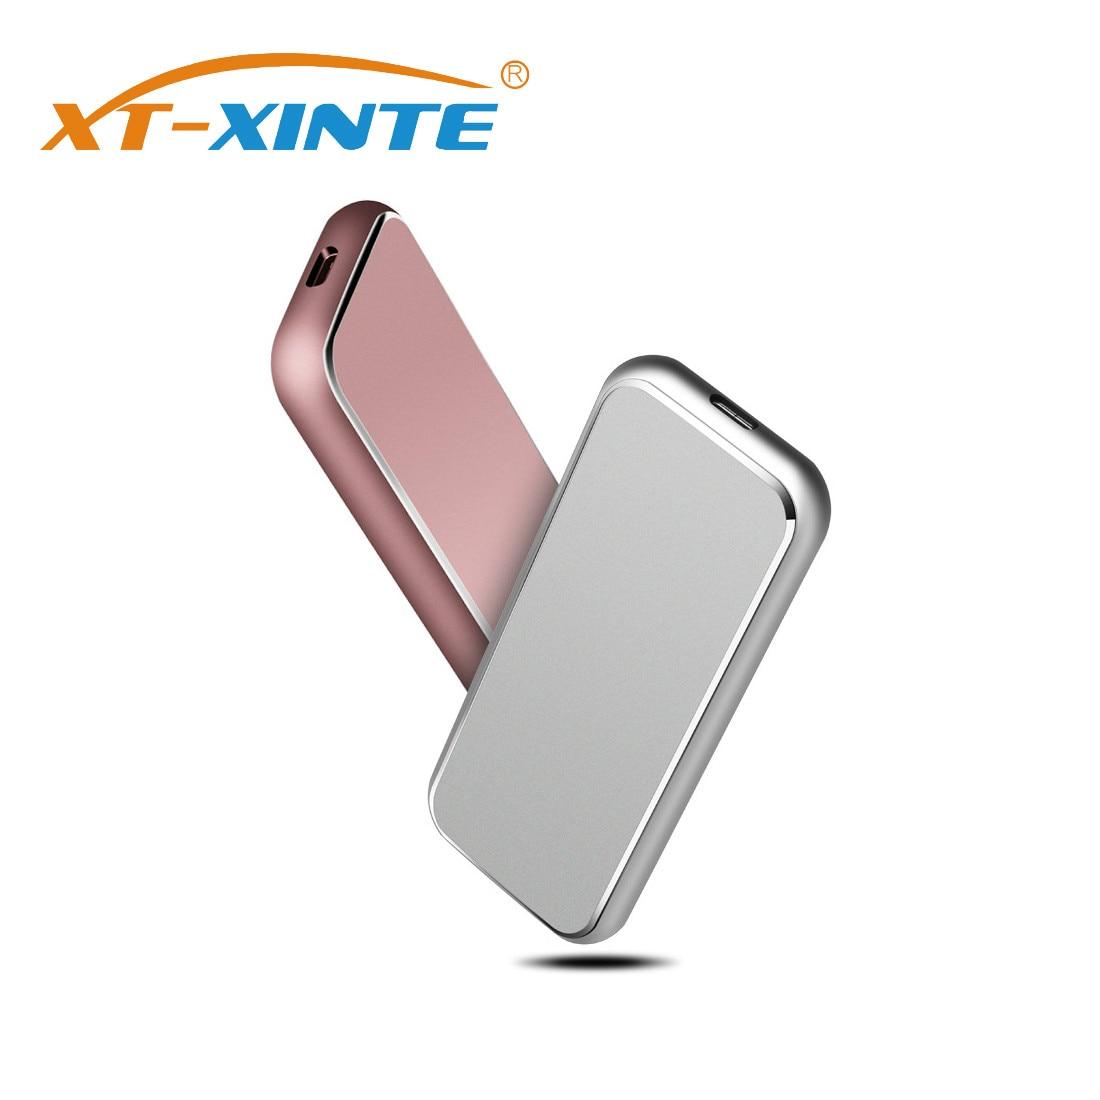 XT-XINTE Aluminium Type-c NVME M.2 Adapter Card HDD Enclosure SSD Case Mobile Hard Disk Box Type-c 10Gbps USB3.1 PCI-E M2